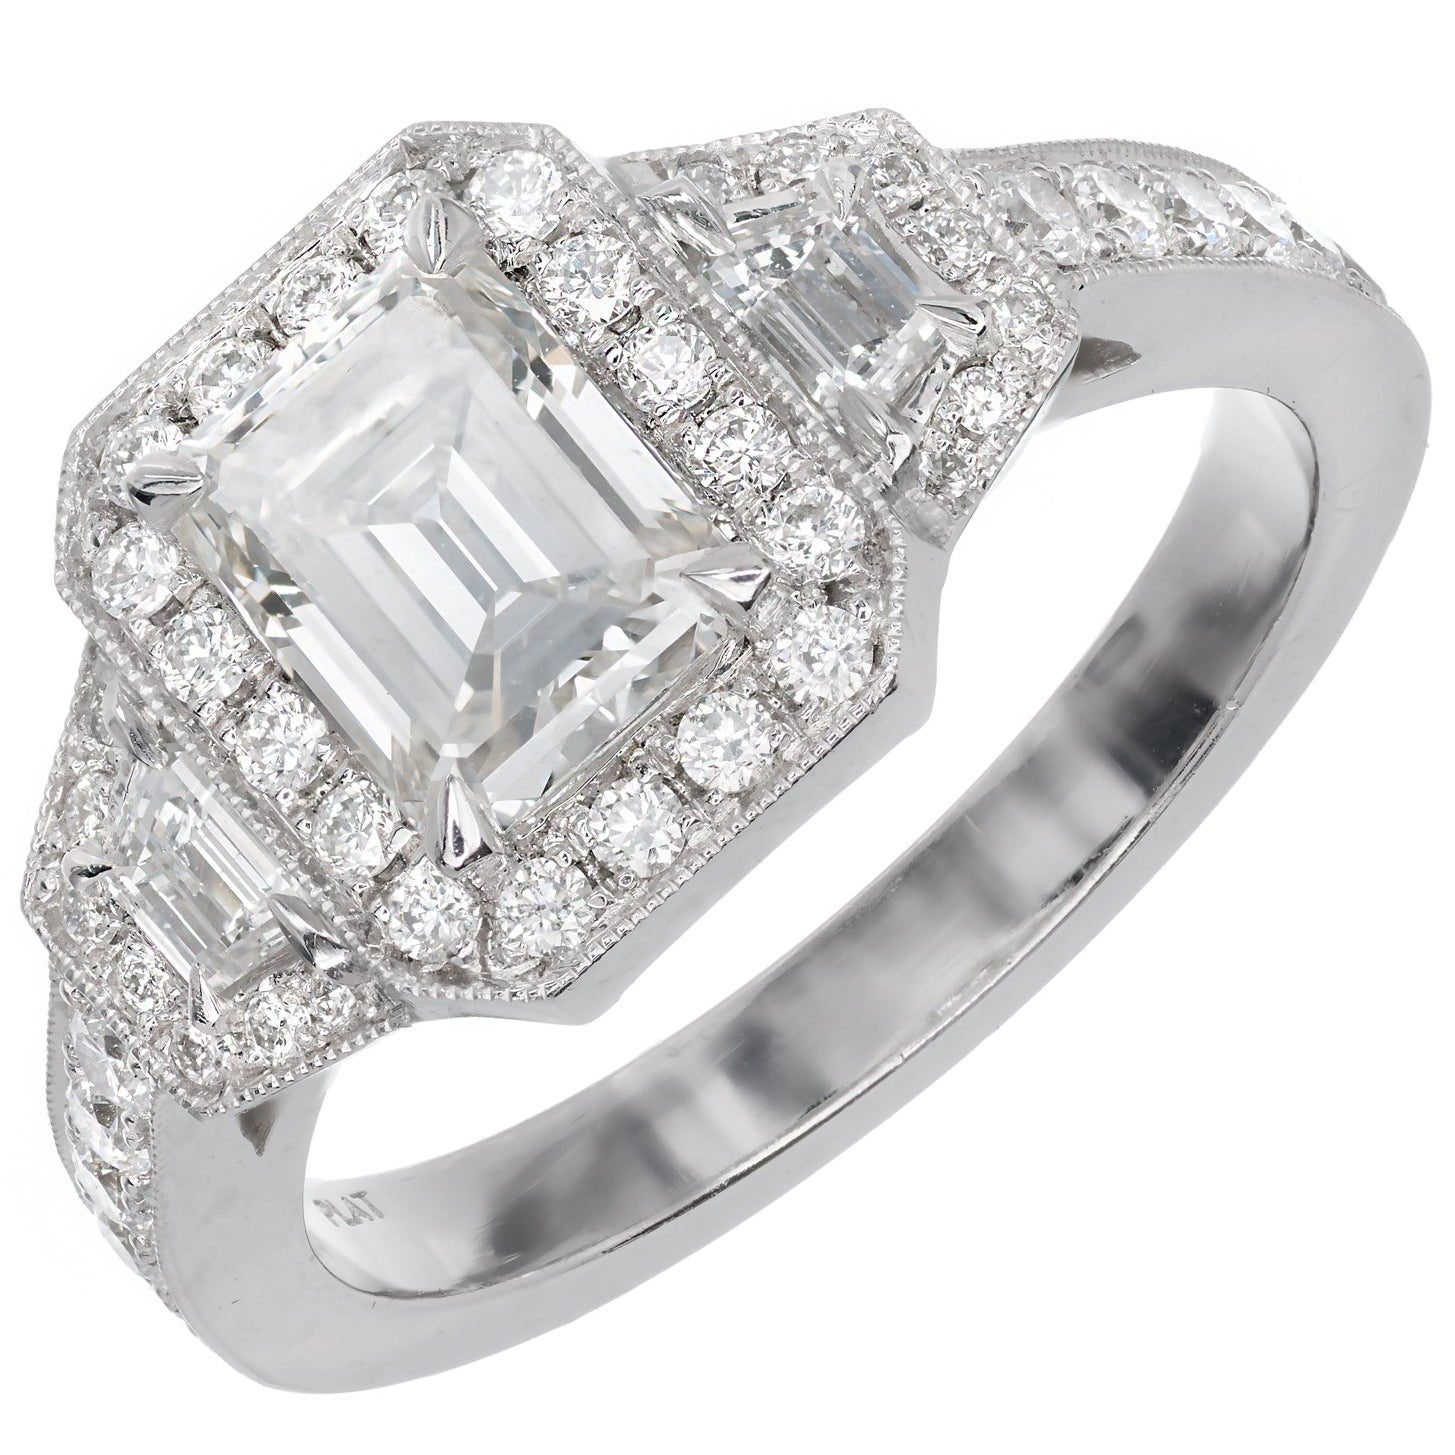 Peter Suchy 1.11 Carat GIA Certified Diamond Platinum Engagement Ring